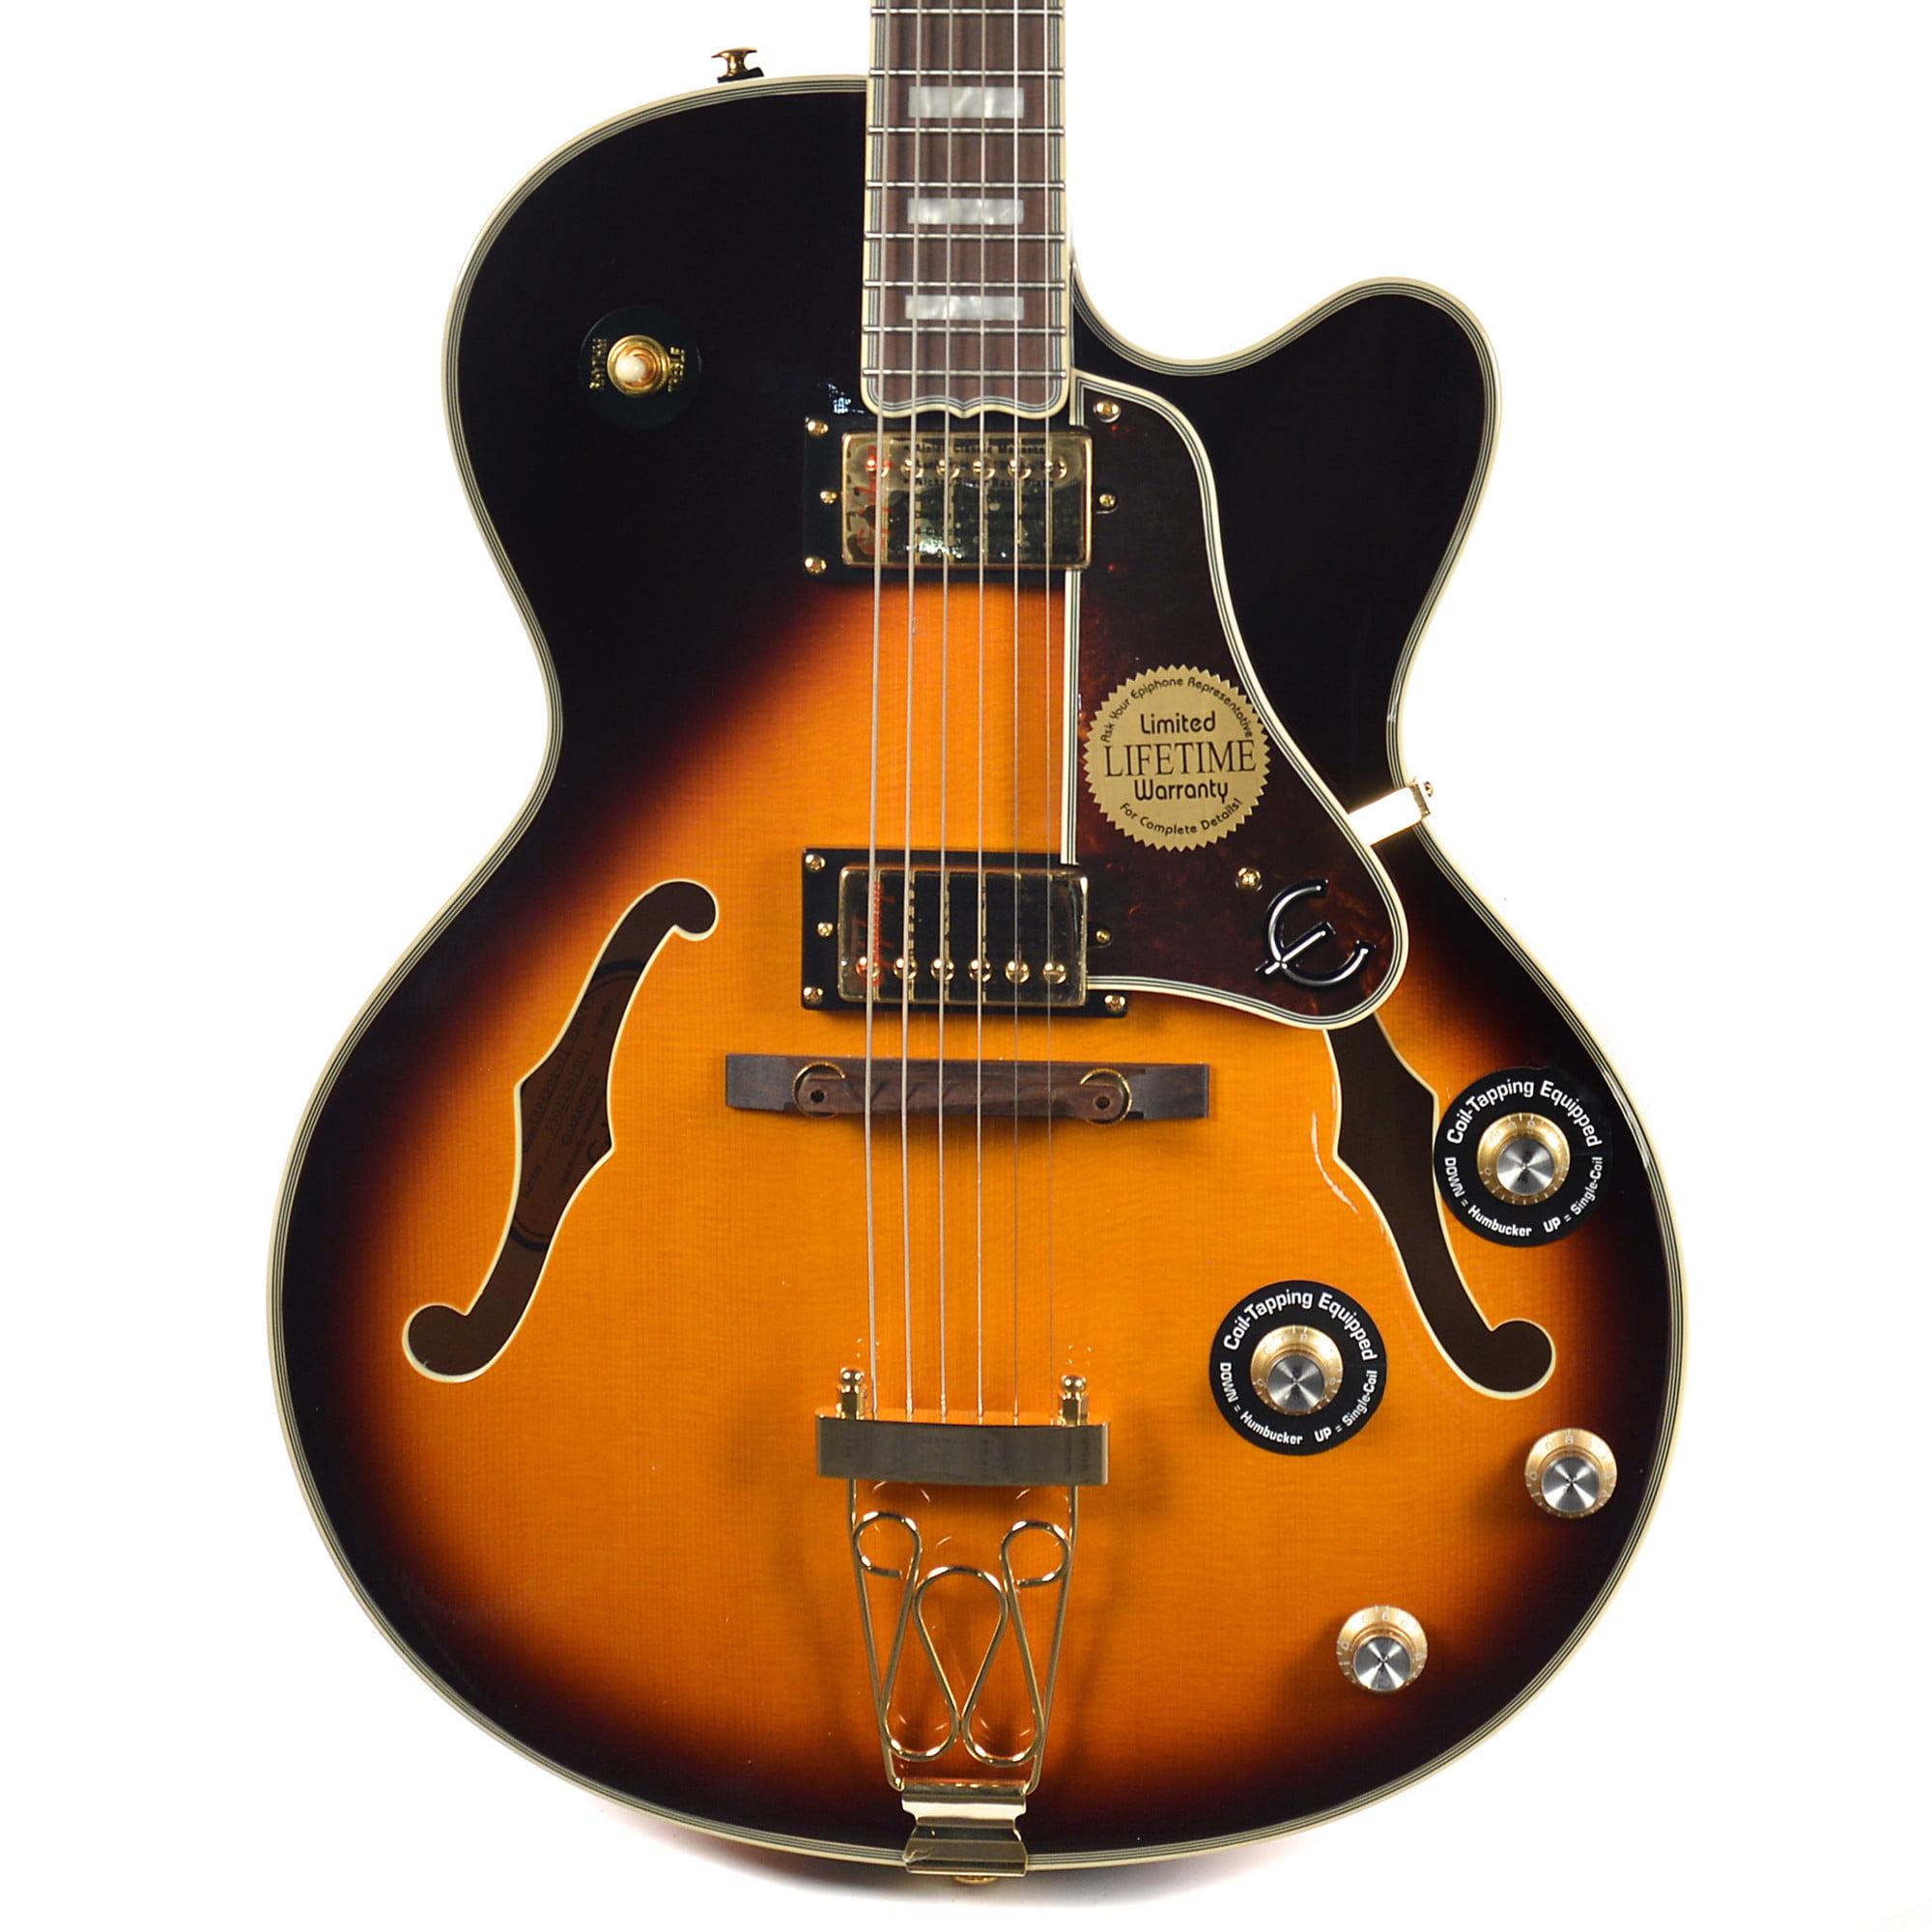 Epiphone Joe Pass Emperor-II PRO Archtop Hollow Body Electric Guitar (Vintage Sunburst) by Epiphone